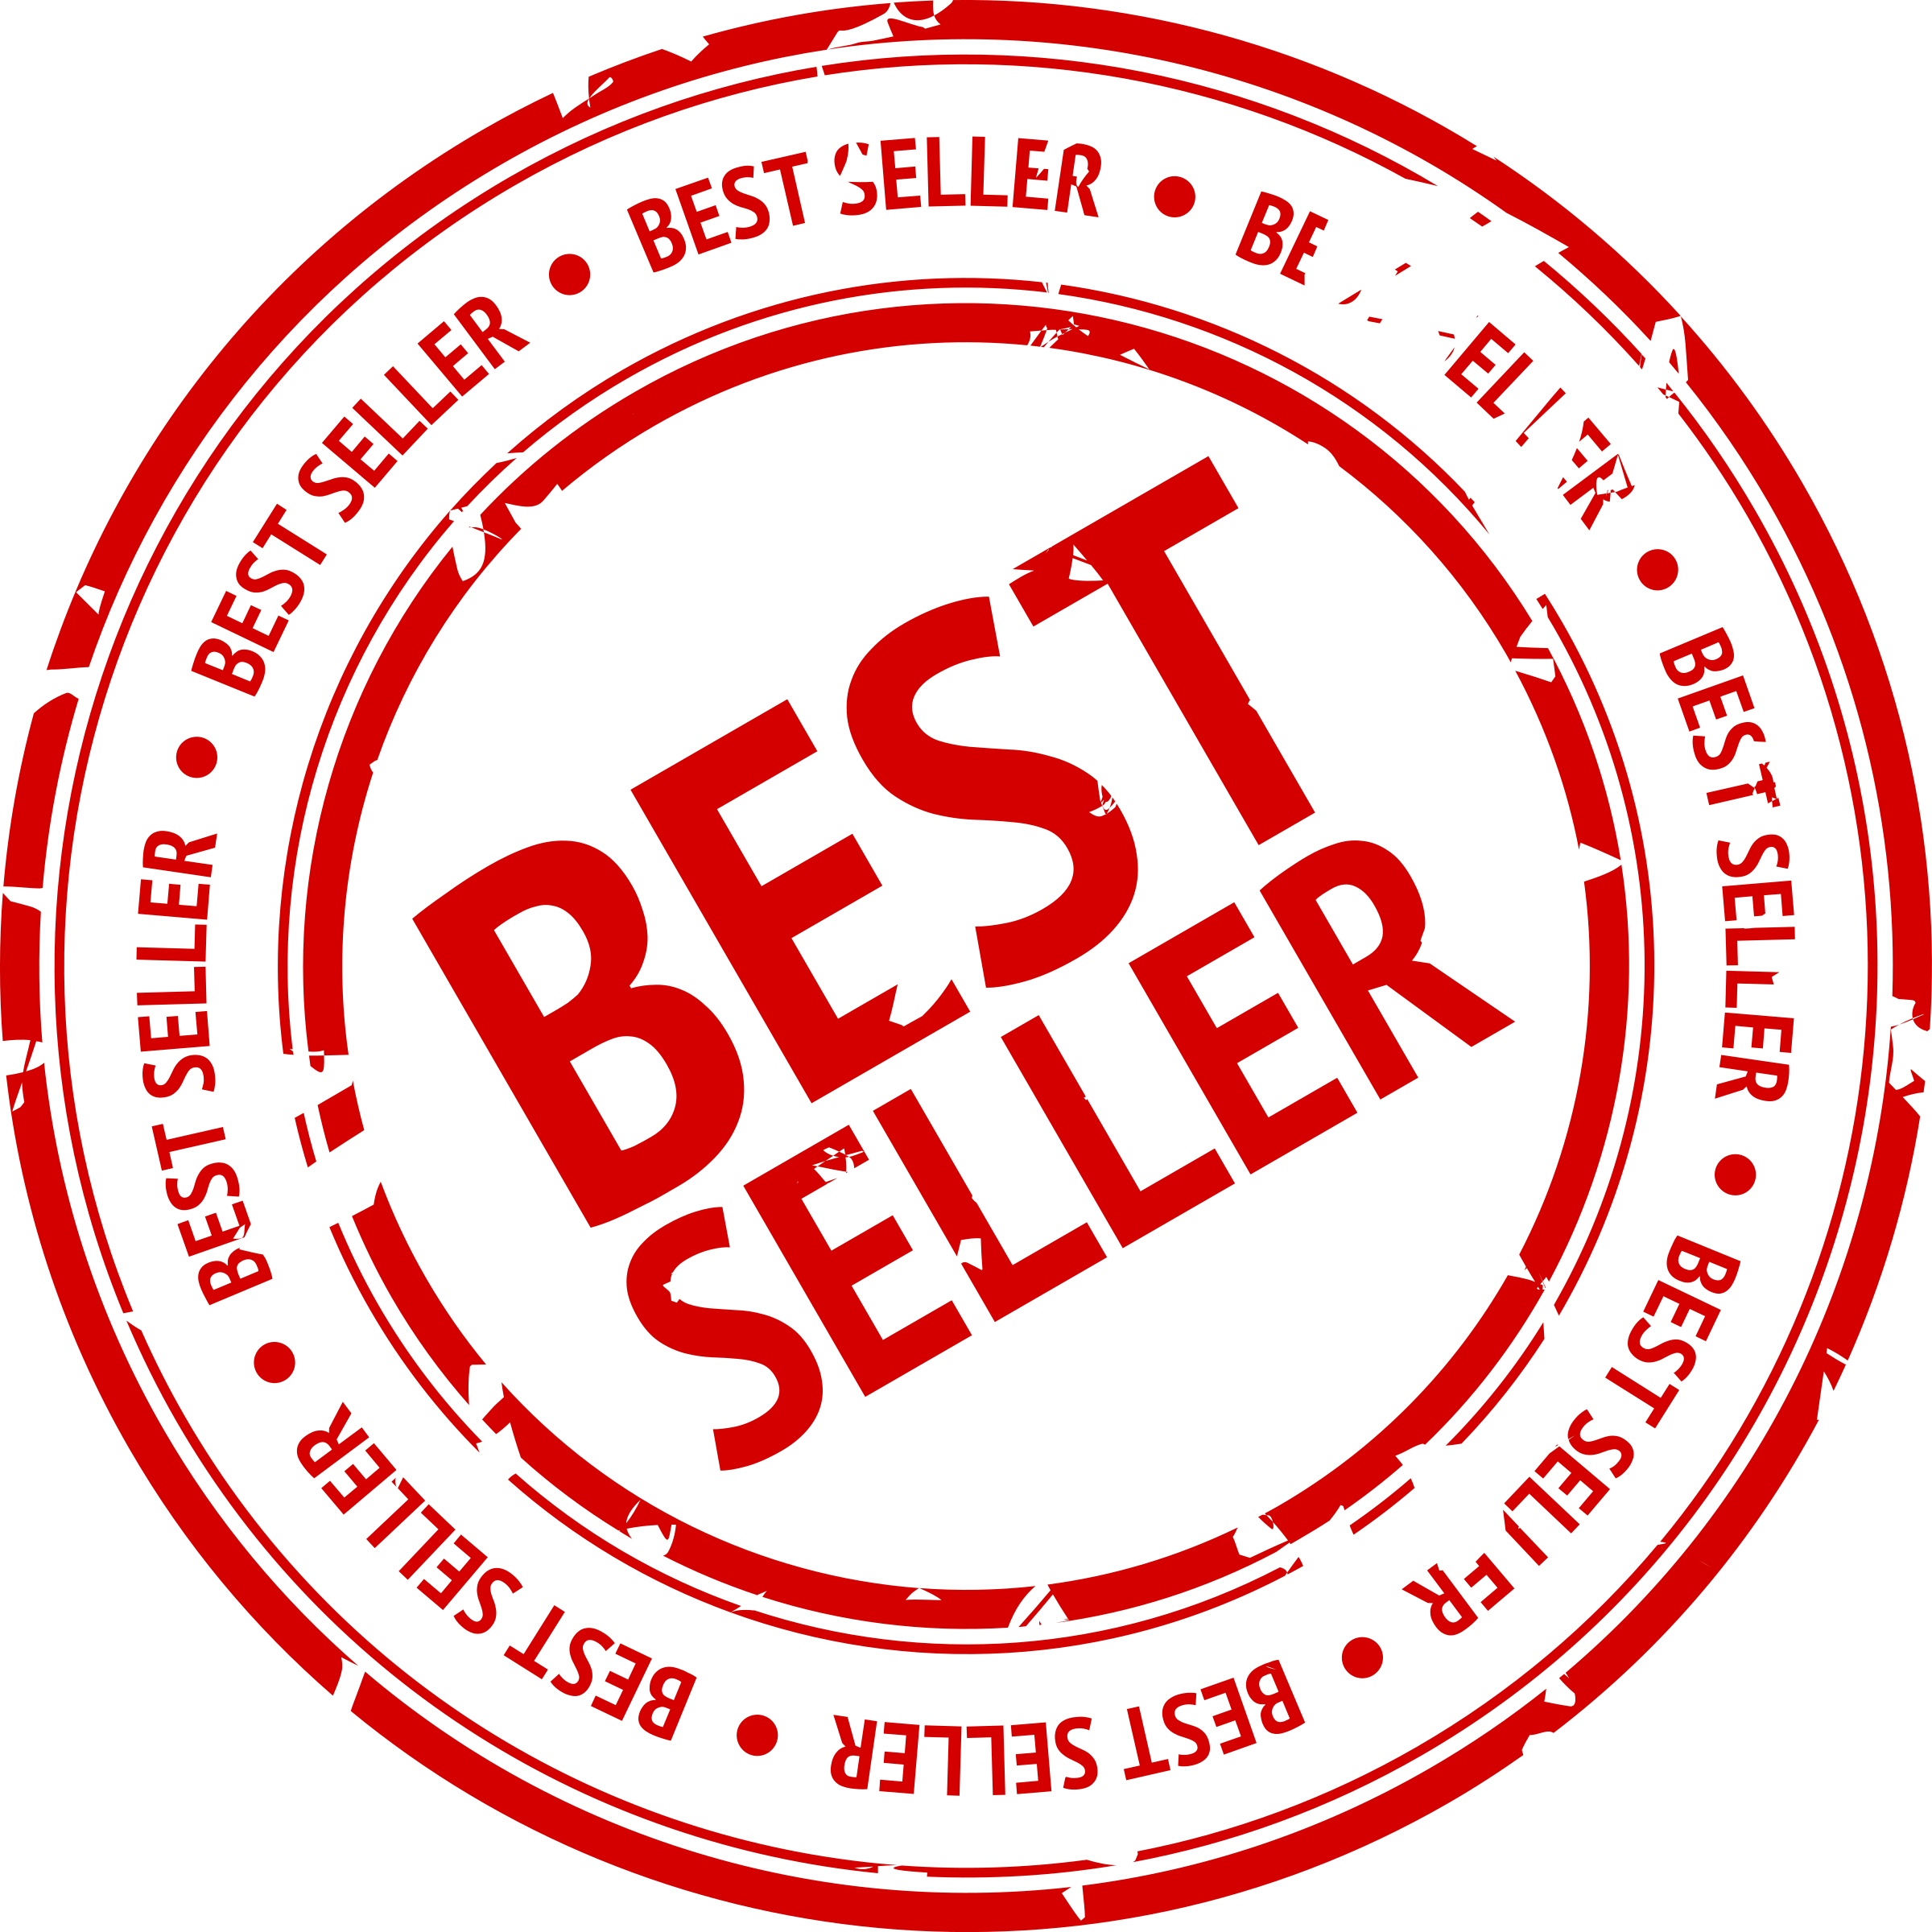 Free Best Seller Stamp png #24402.